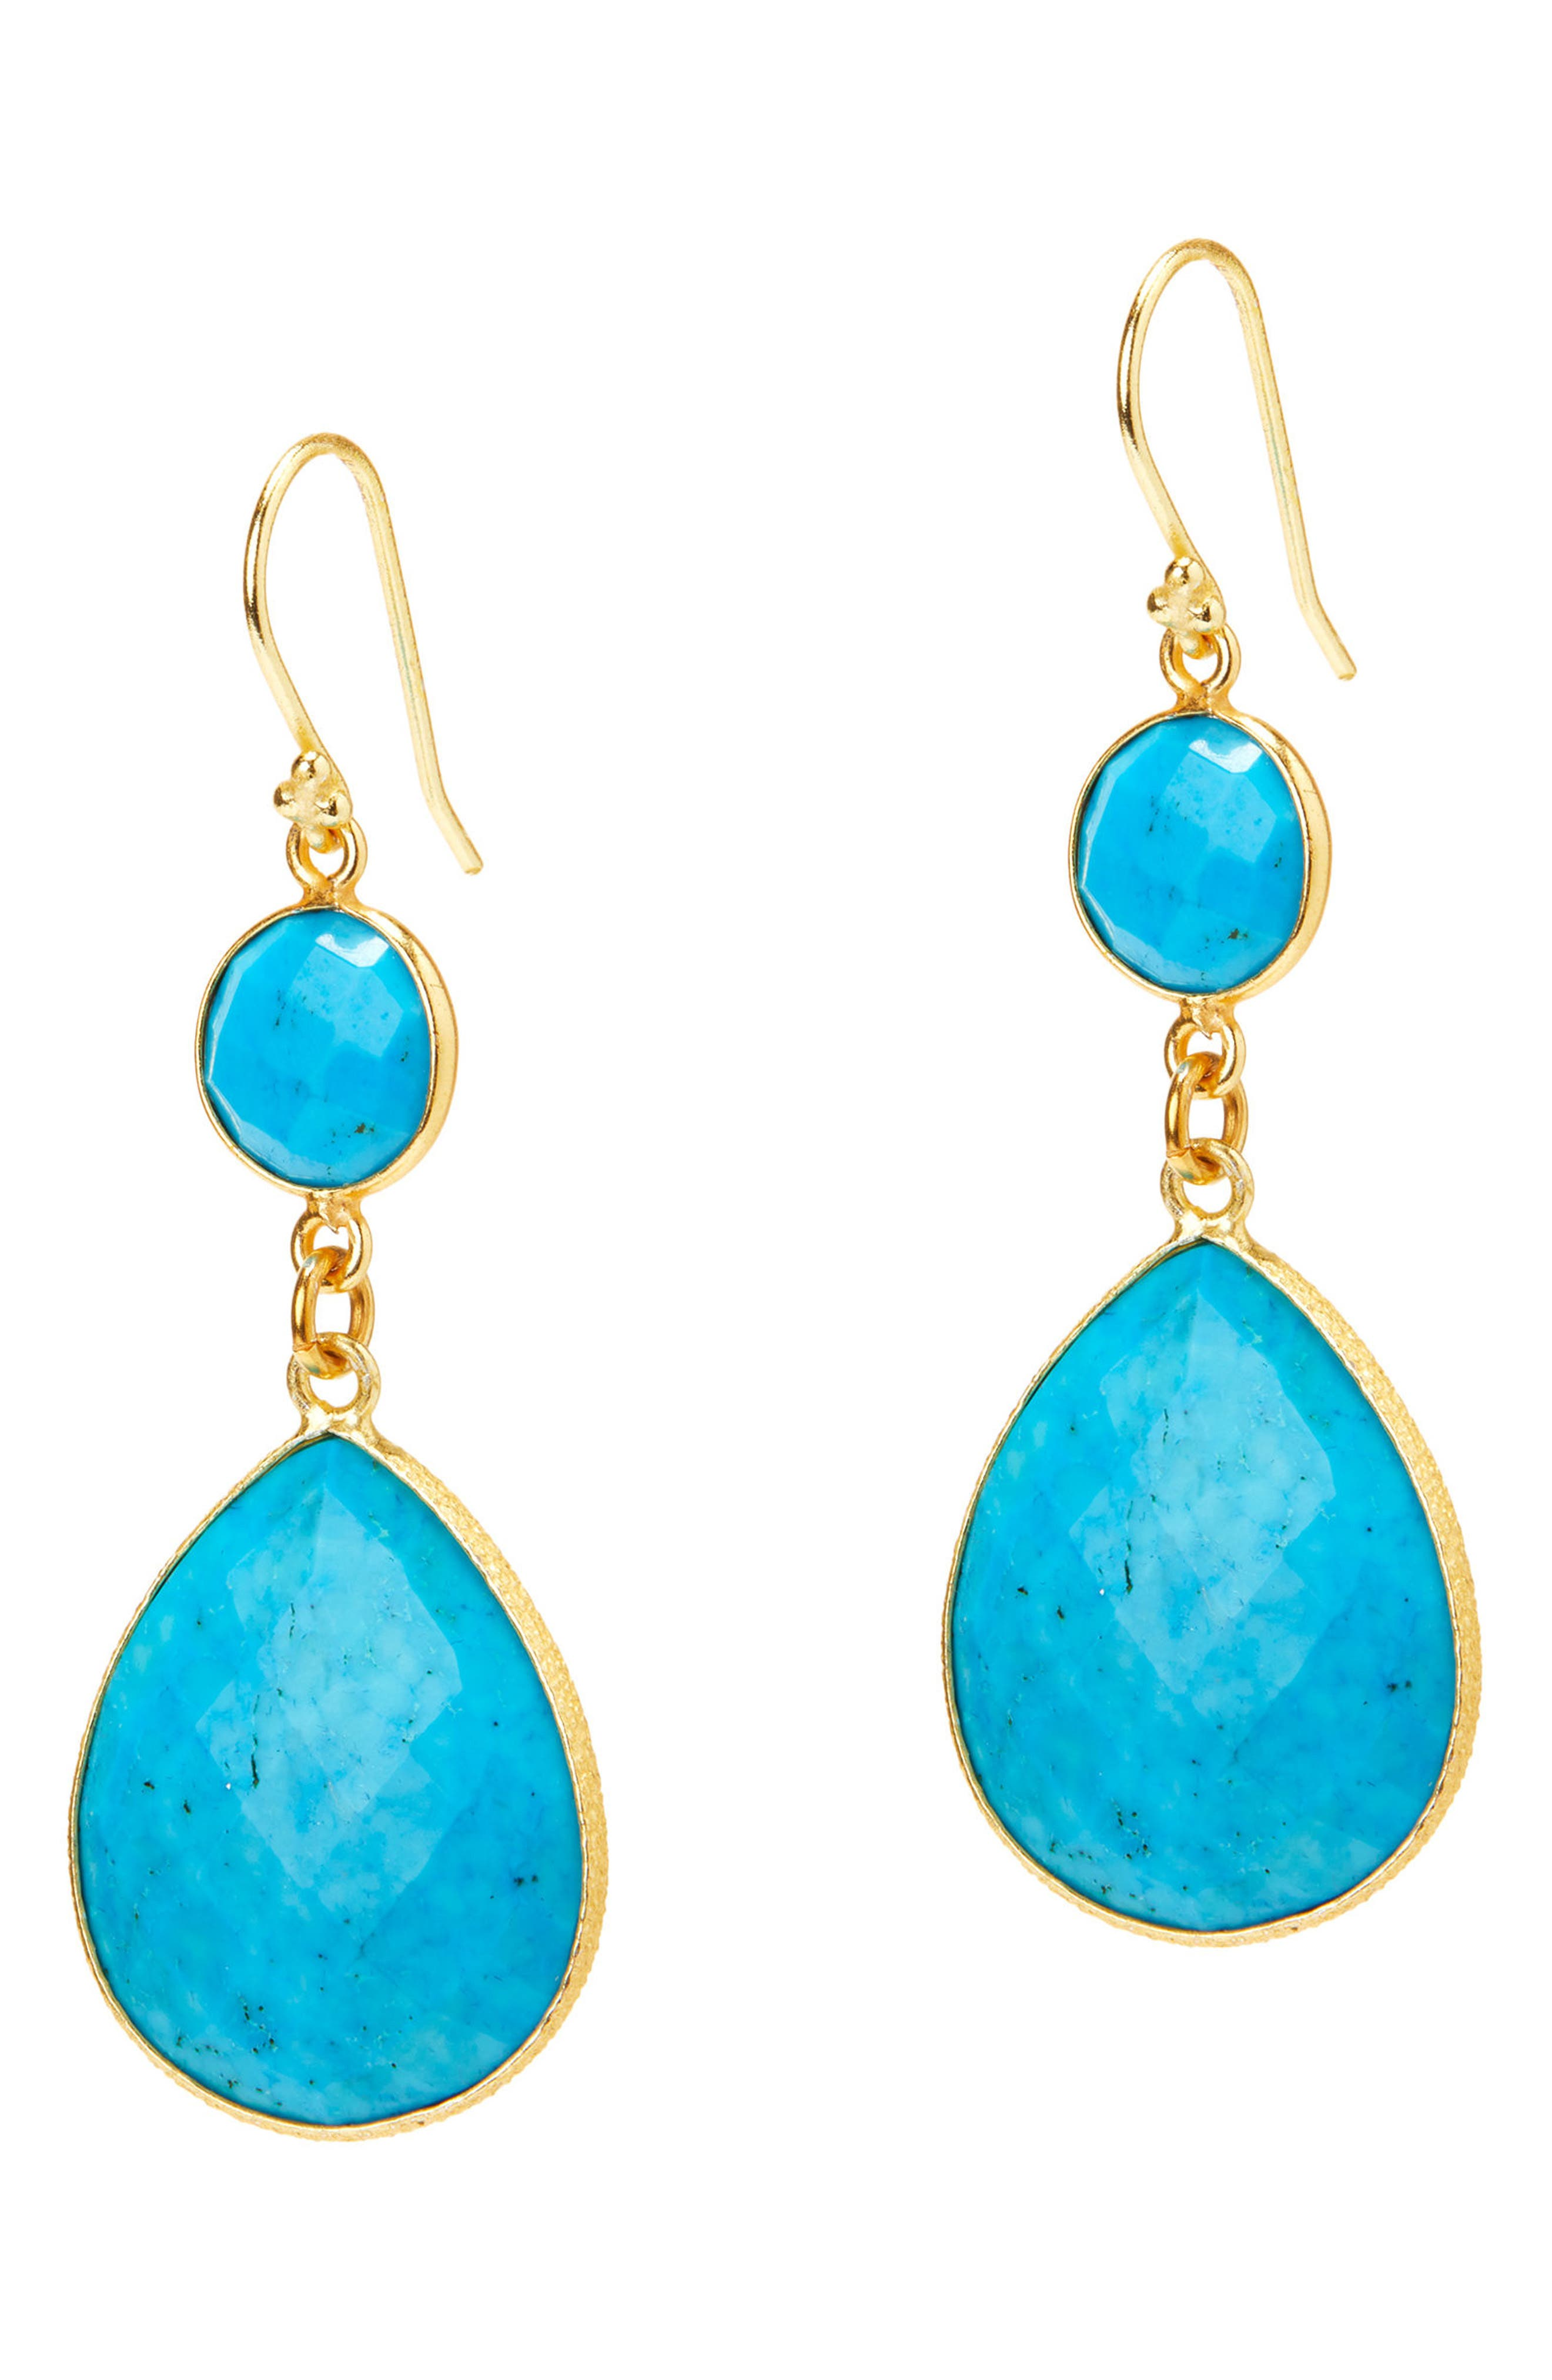 Plumeria Double Drop Earrings,                             Main thumbnail 1, color,                             Turquoise